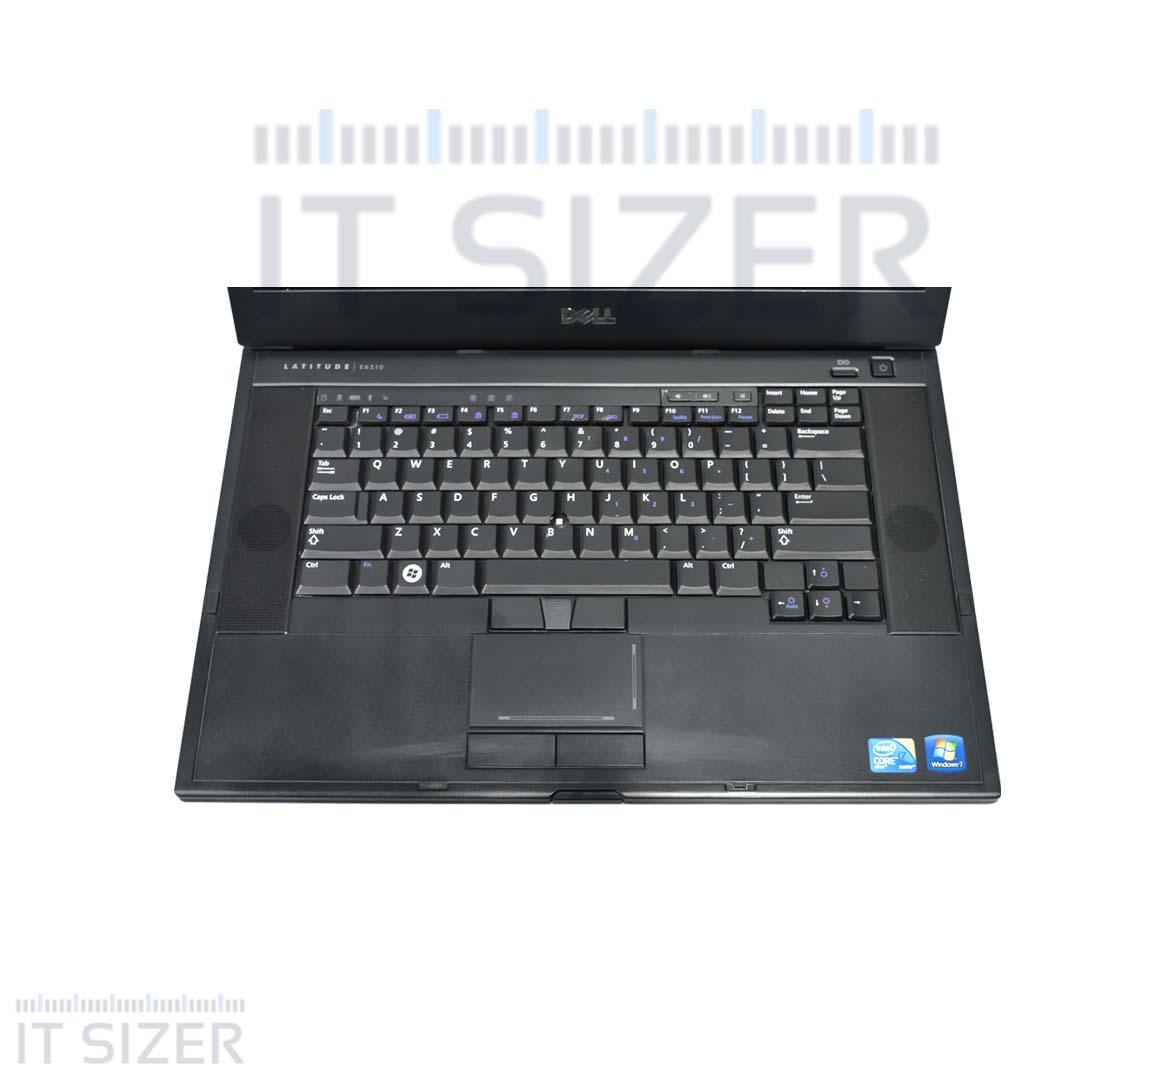 Dell Latitude E6510 Business Laptop, Intel Core i7-620M CPU, 8GB DDR3 SODIMM RAM, 750GB SATA 2.5 Hard, 14 inch Display, Windows 10 Pro (Renewed)